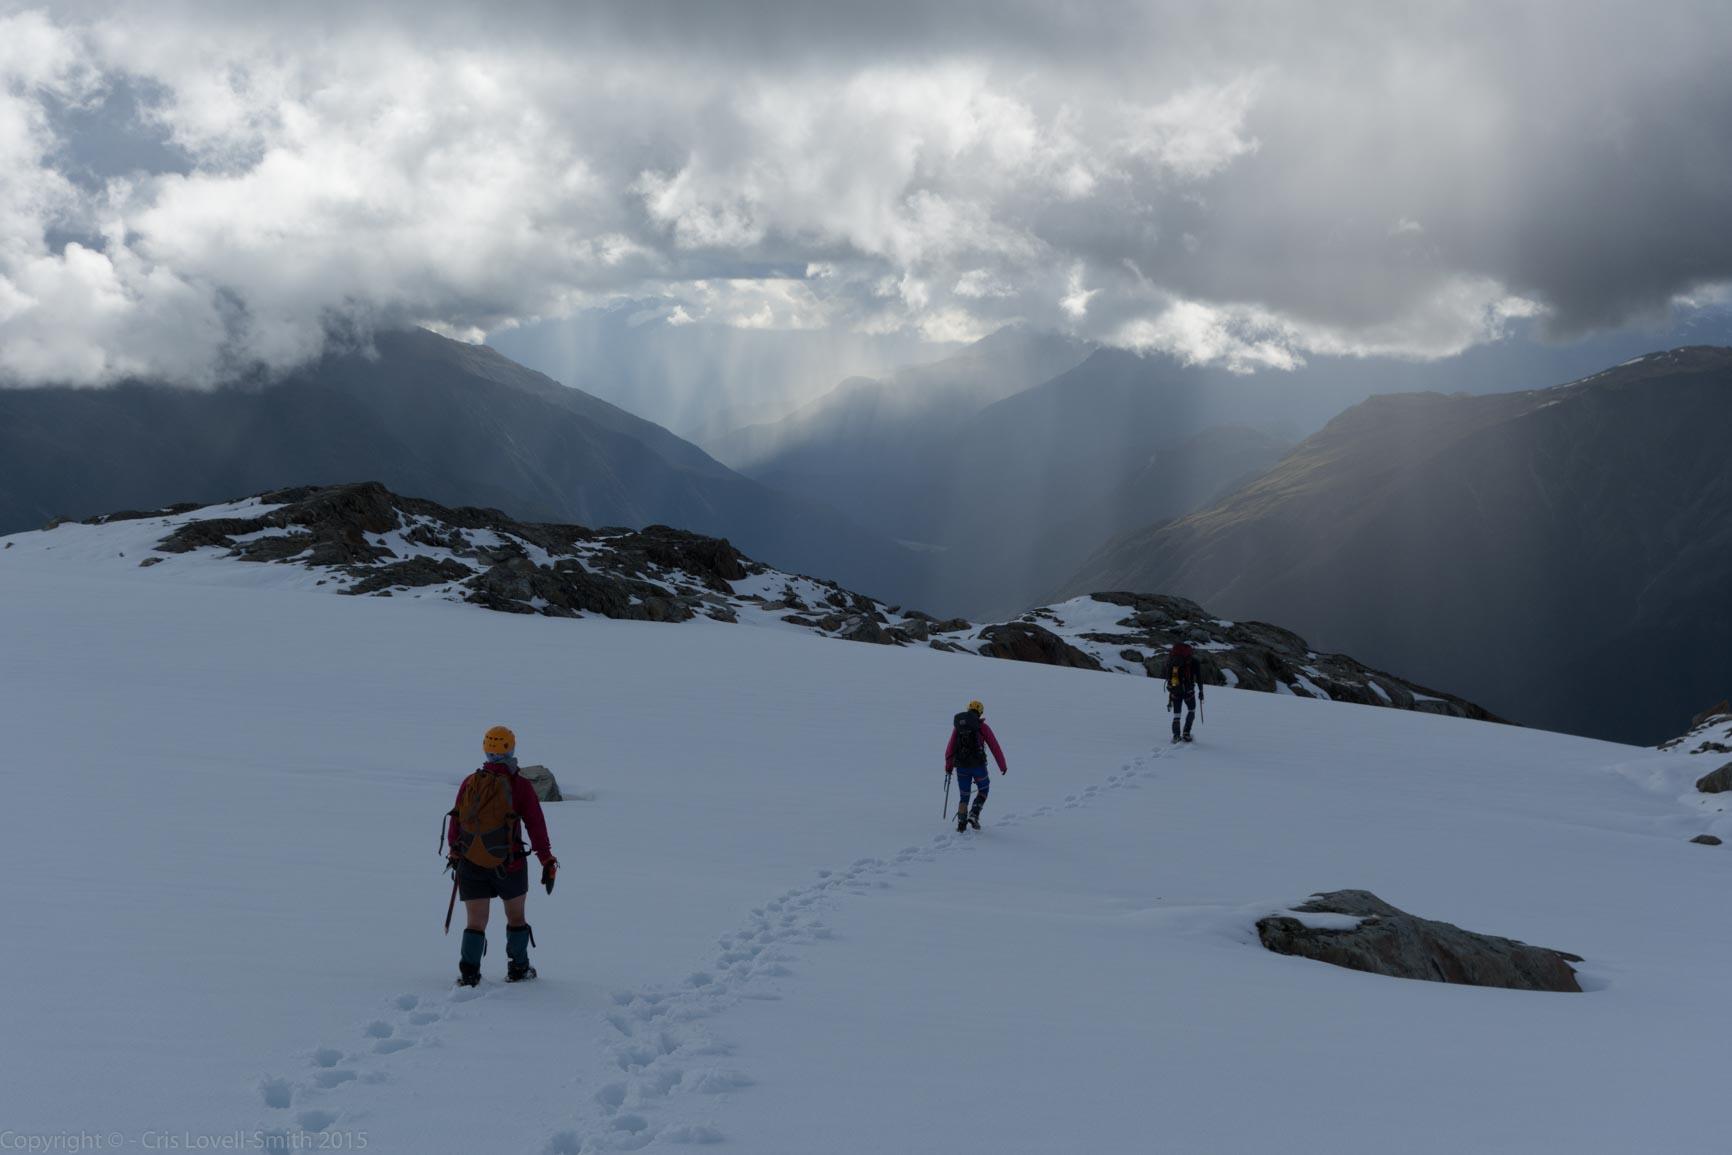 Descending towards the Landsborough (Hopkins Valley Tramp Jan 20